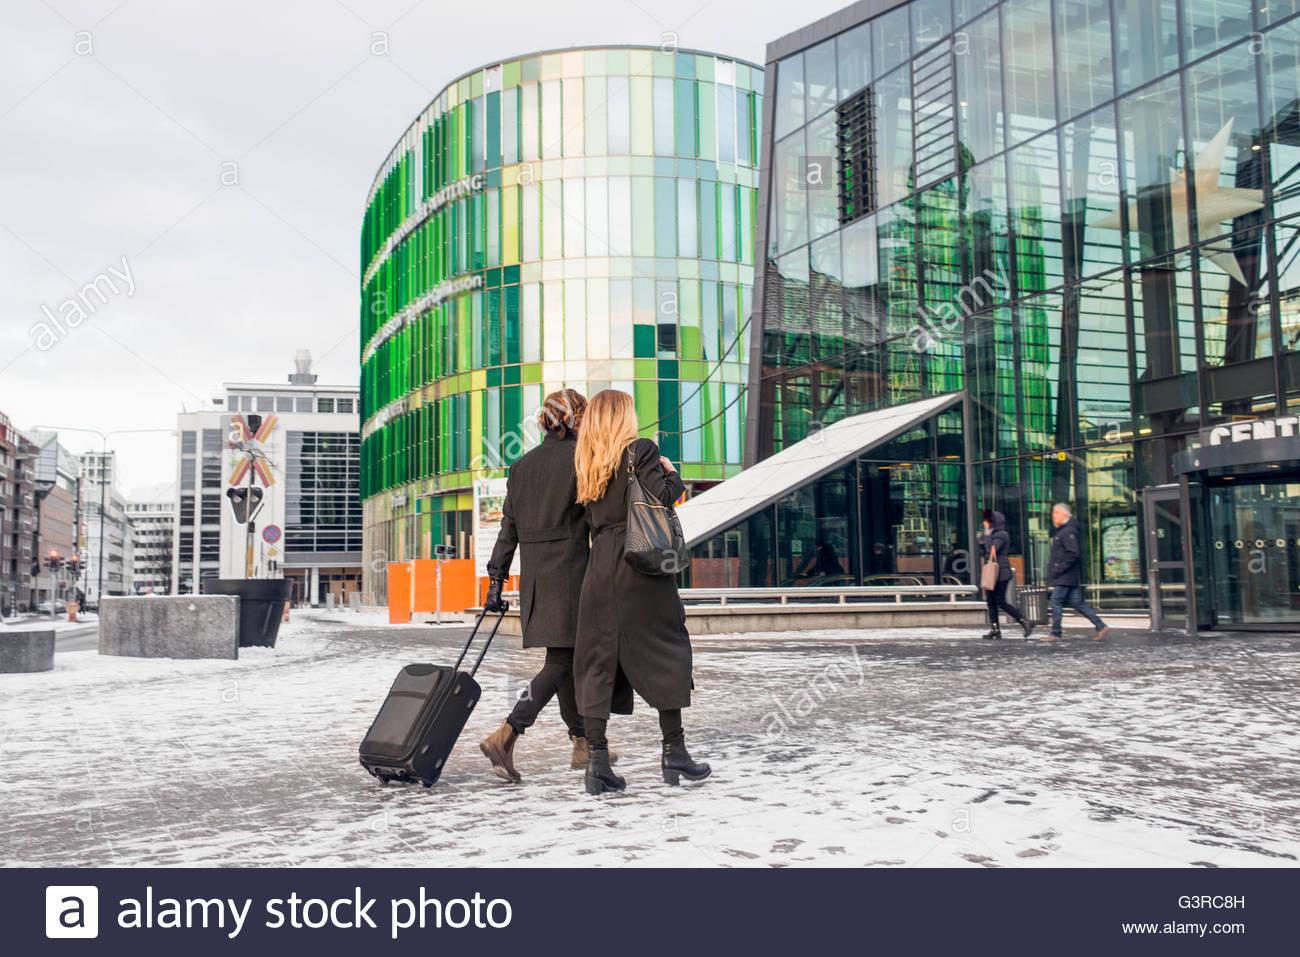 Sweden, Skane, Malmo, Couple with wheeled luggage walking towards modern building - Stock Image